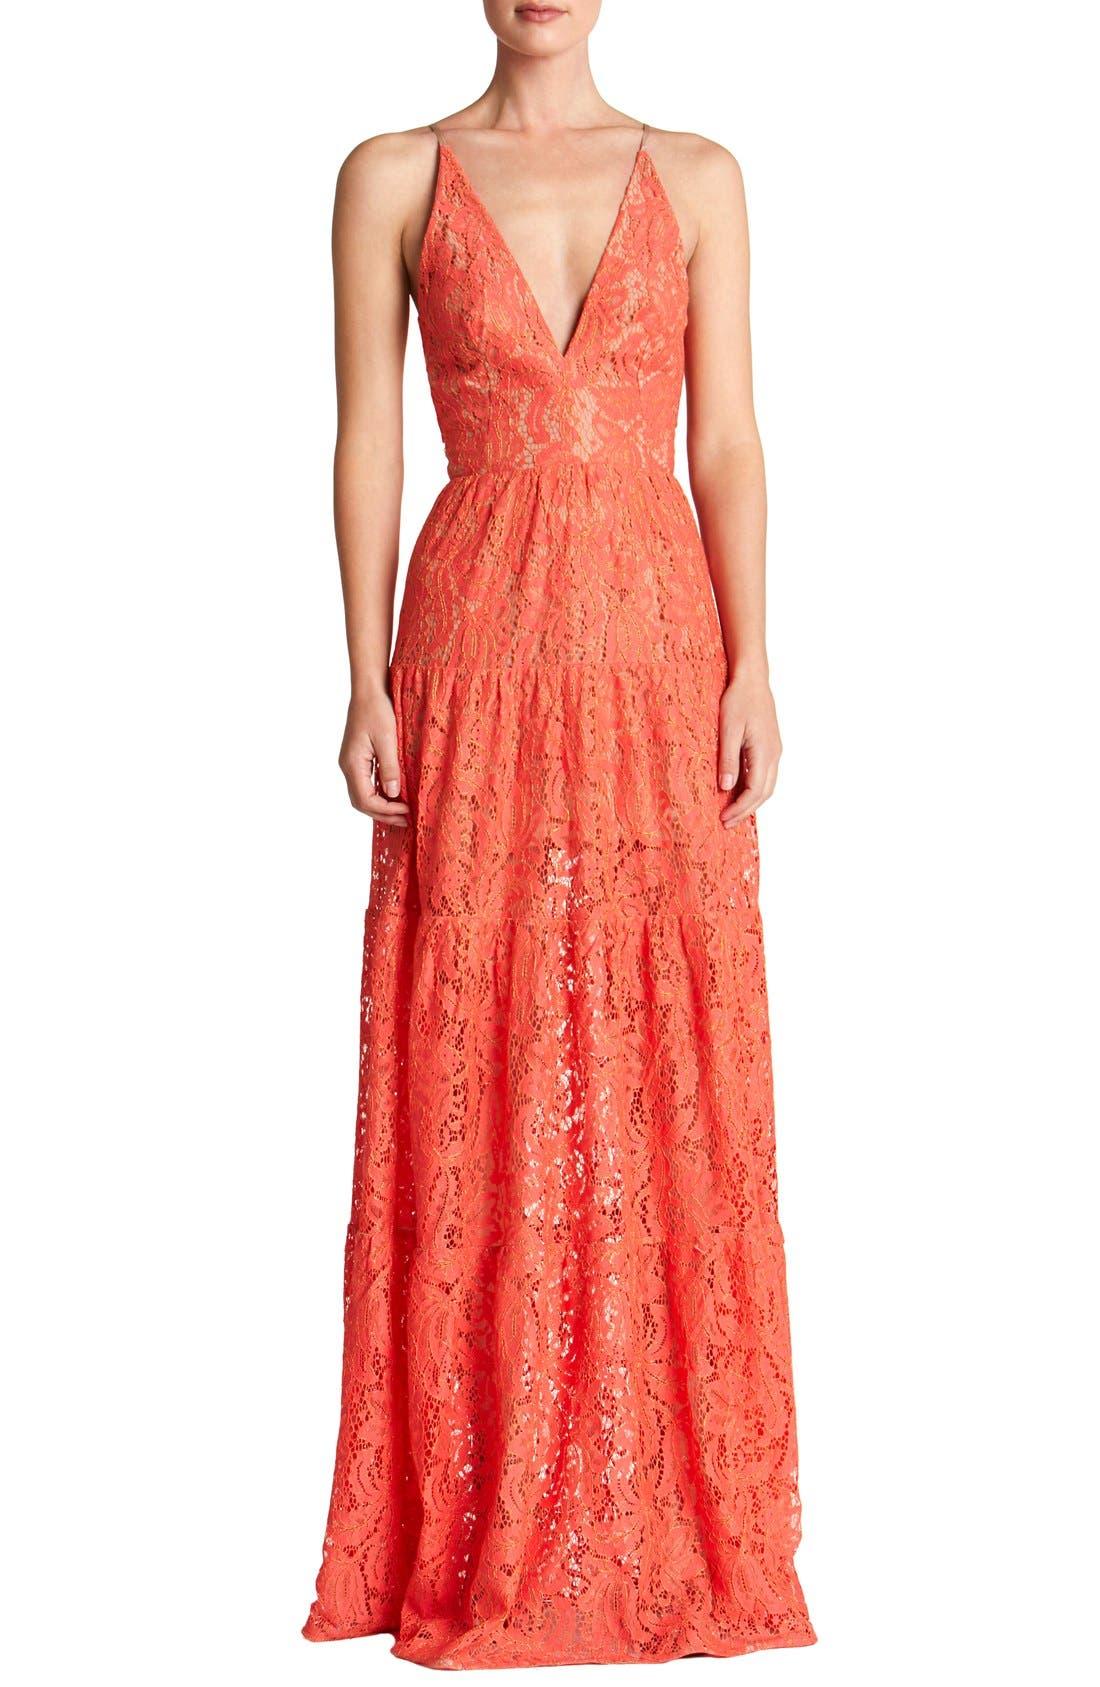 Main Image - Dress the Population Melina Lace Fit & Flare Maxi Dress